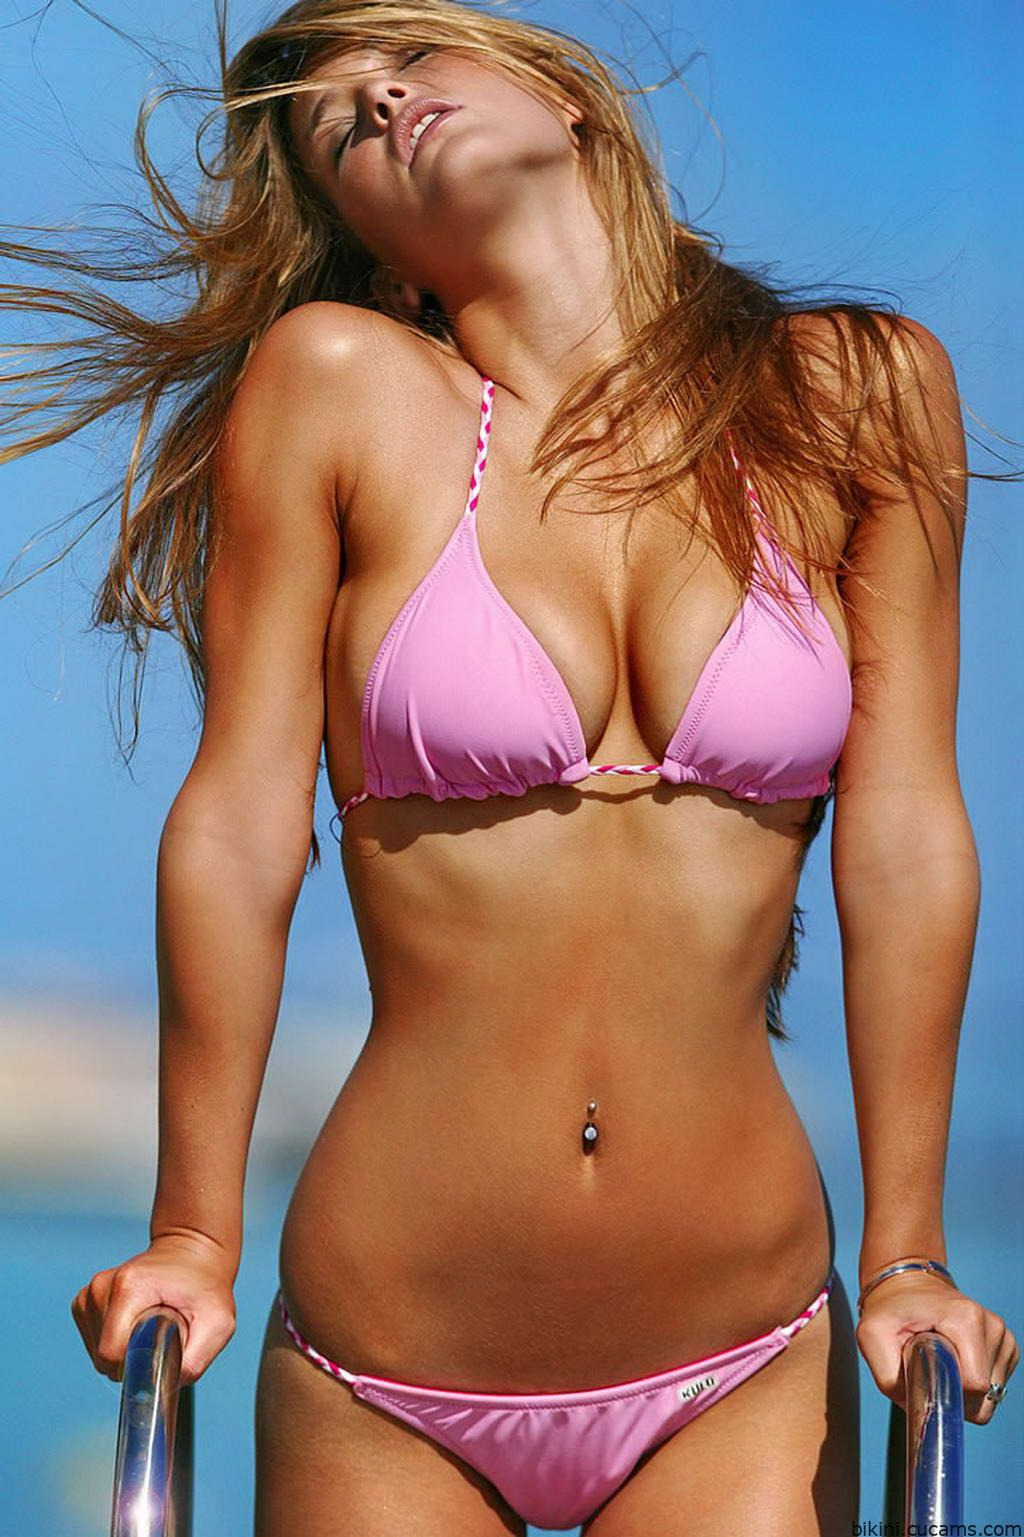 Bikini Posing Straight by bikini.cucams.com